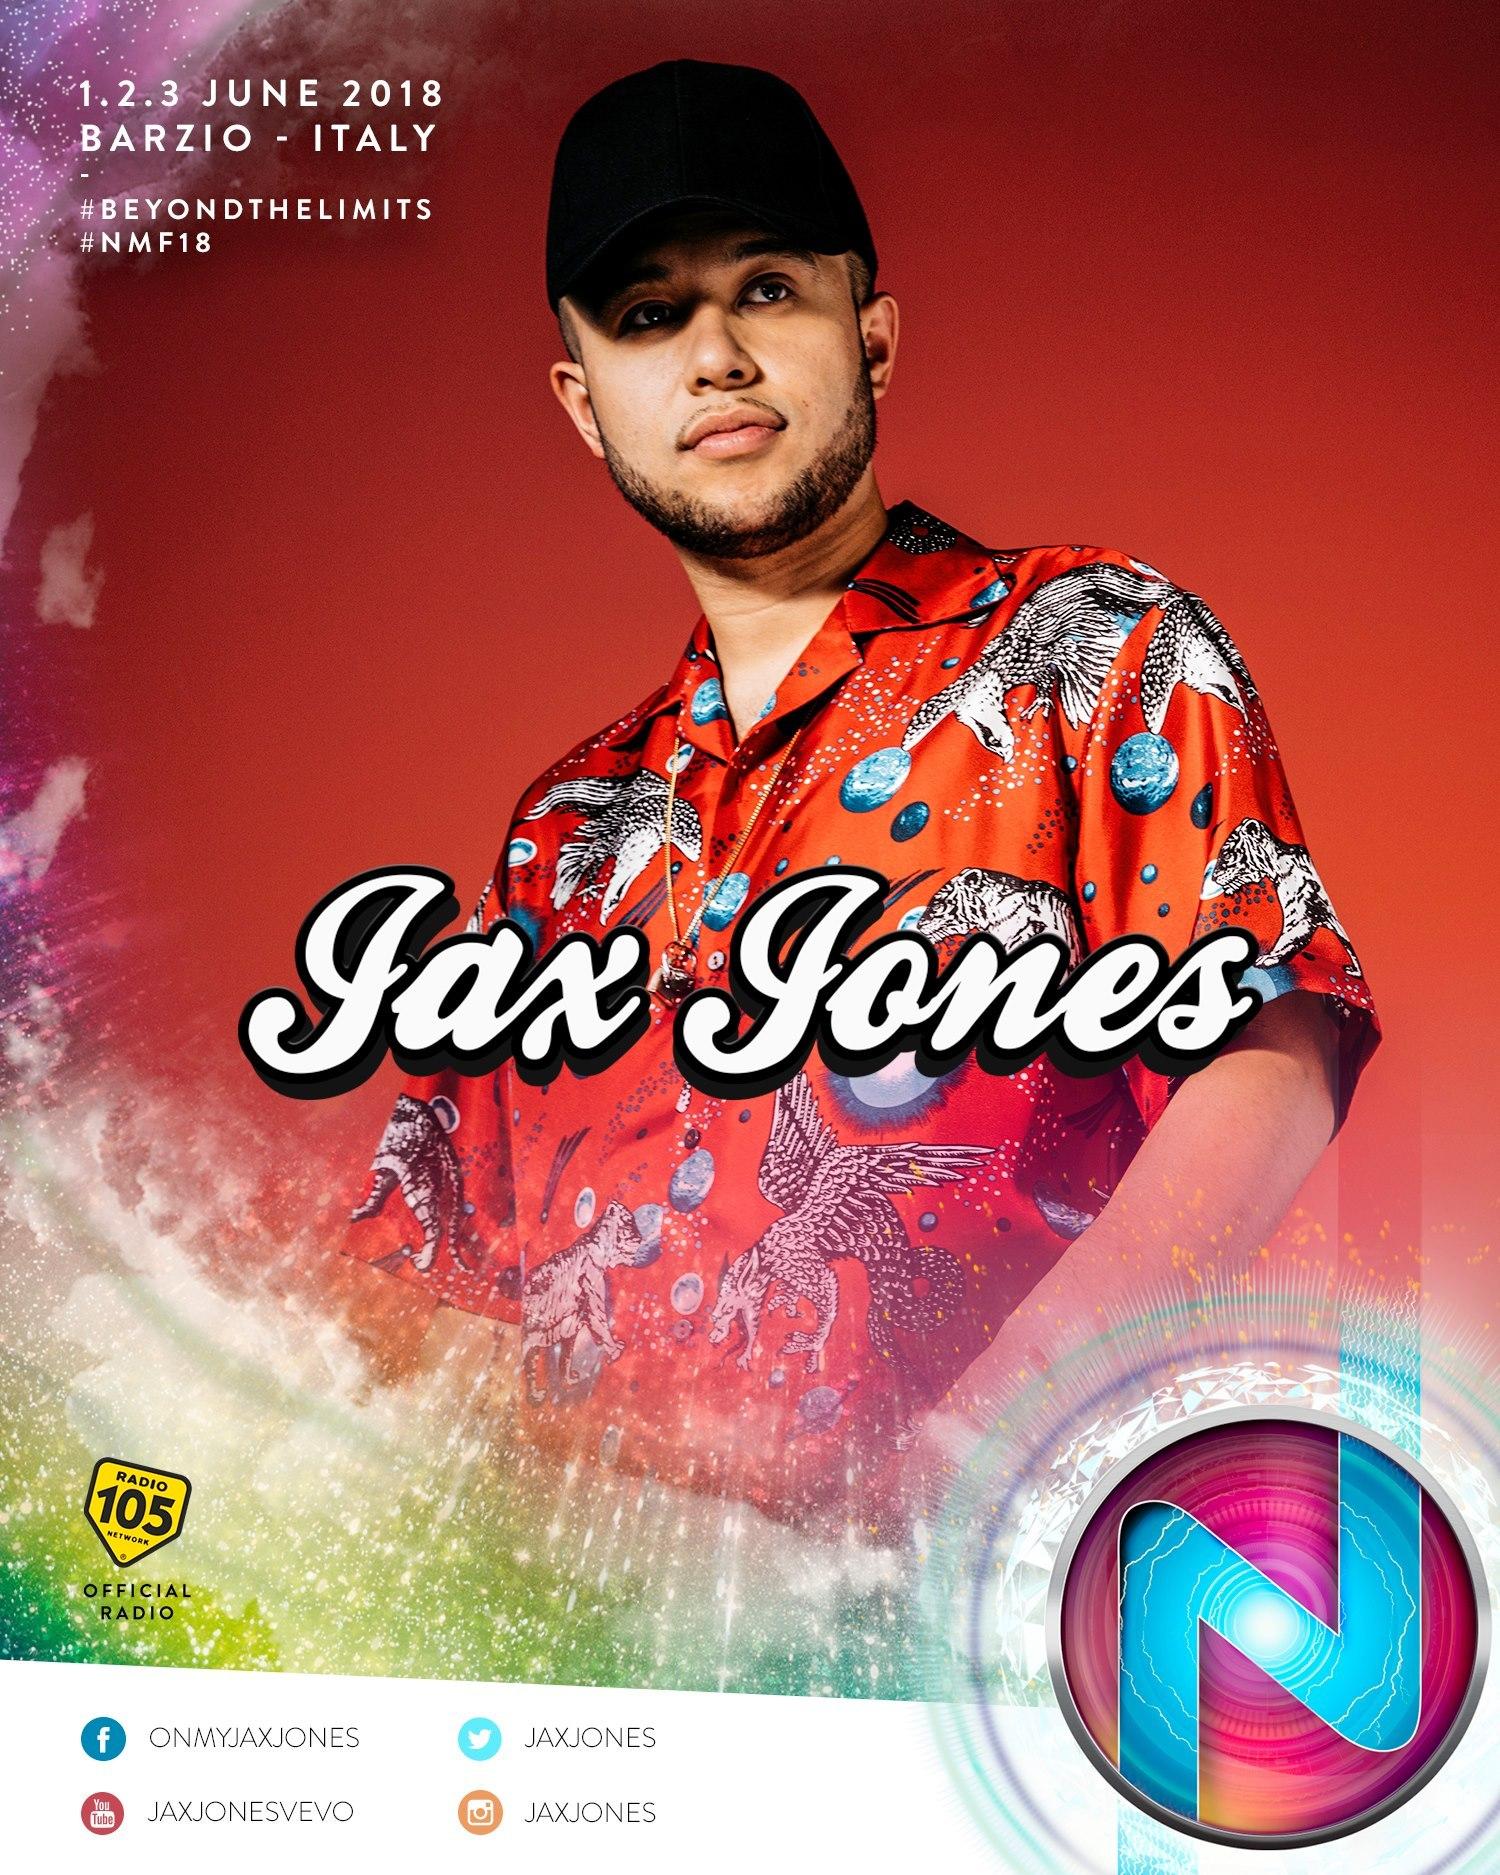 Nameless Music Festival 2018 annunciata la line up Jax Jones